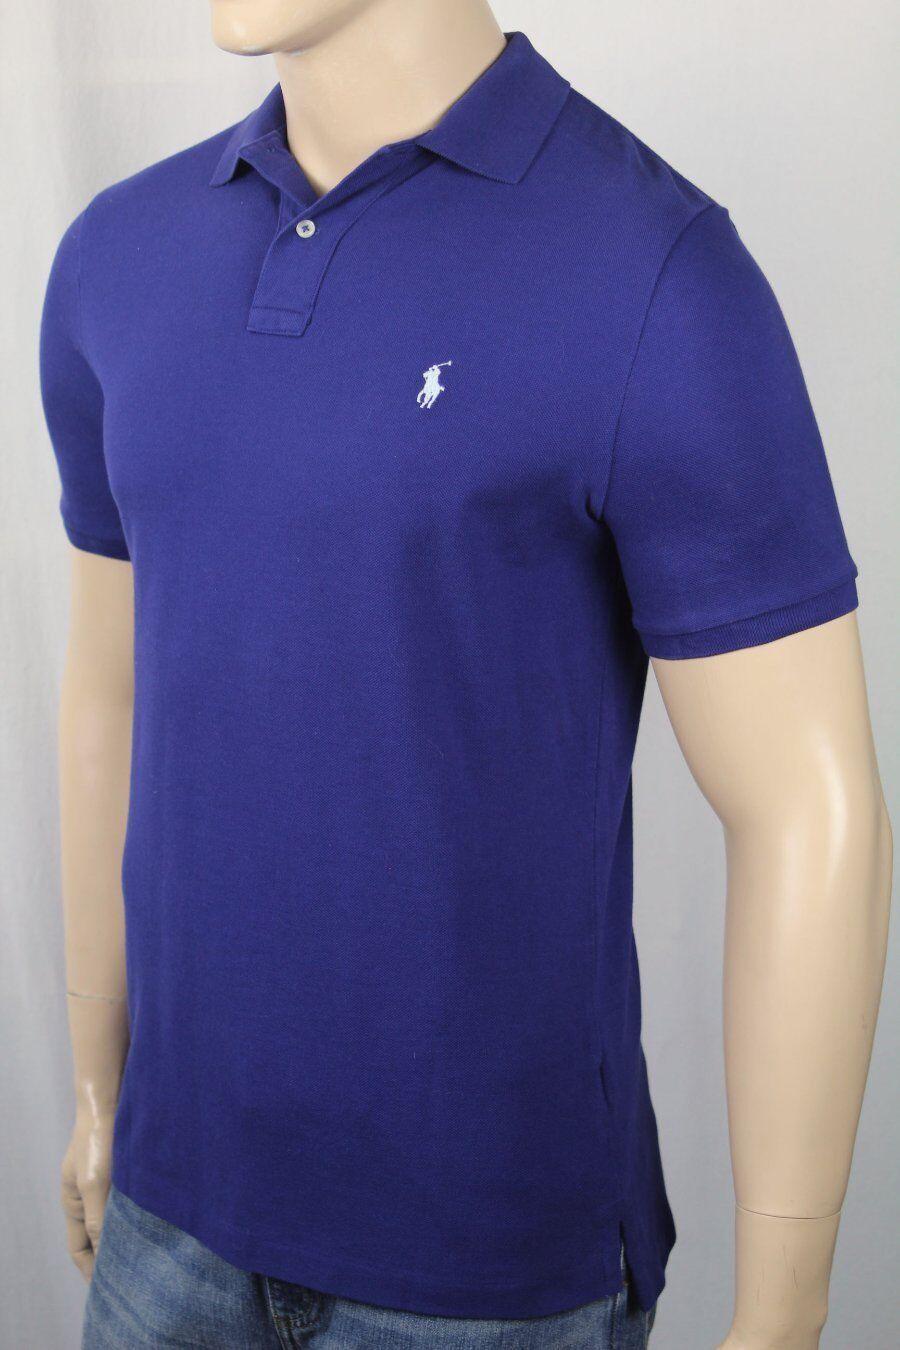 ee980ba0 Polo Ralph Lauren bluee Classic Mesh Shirt bluee Pony NWT Fit Sky ...